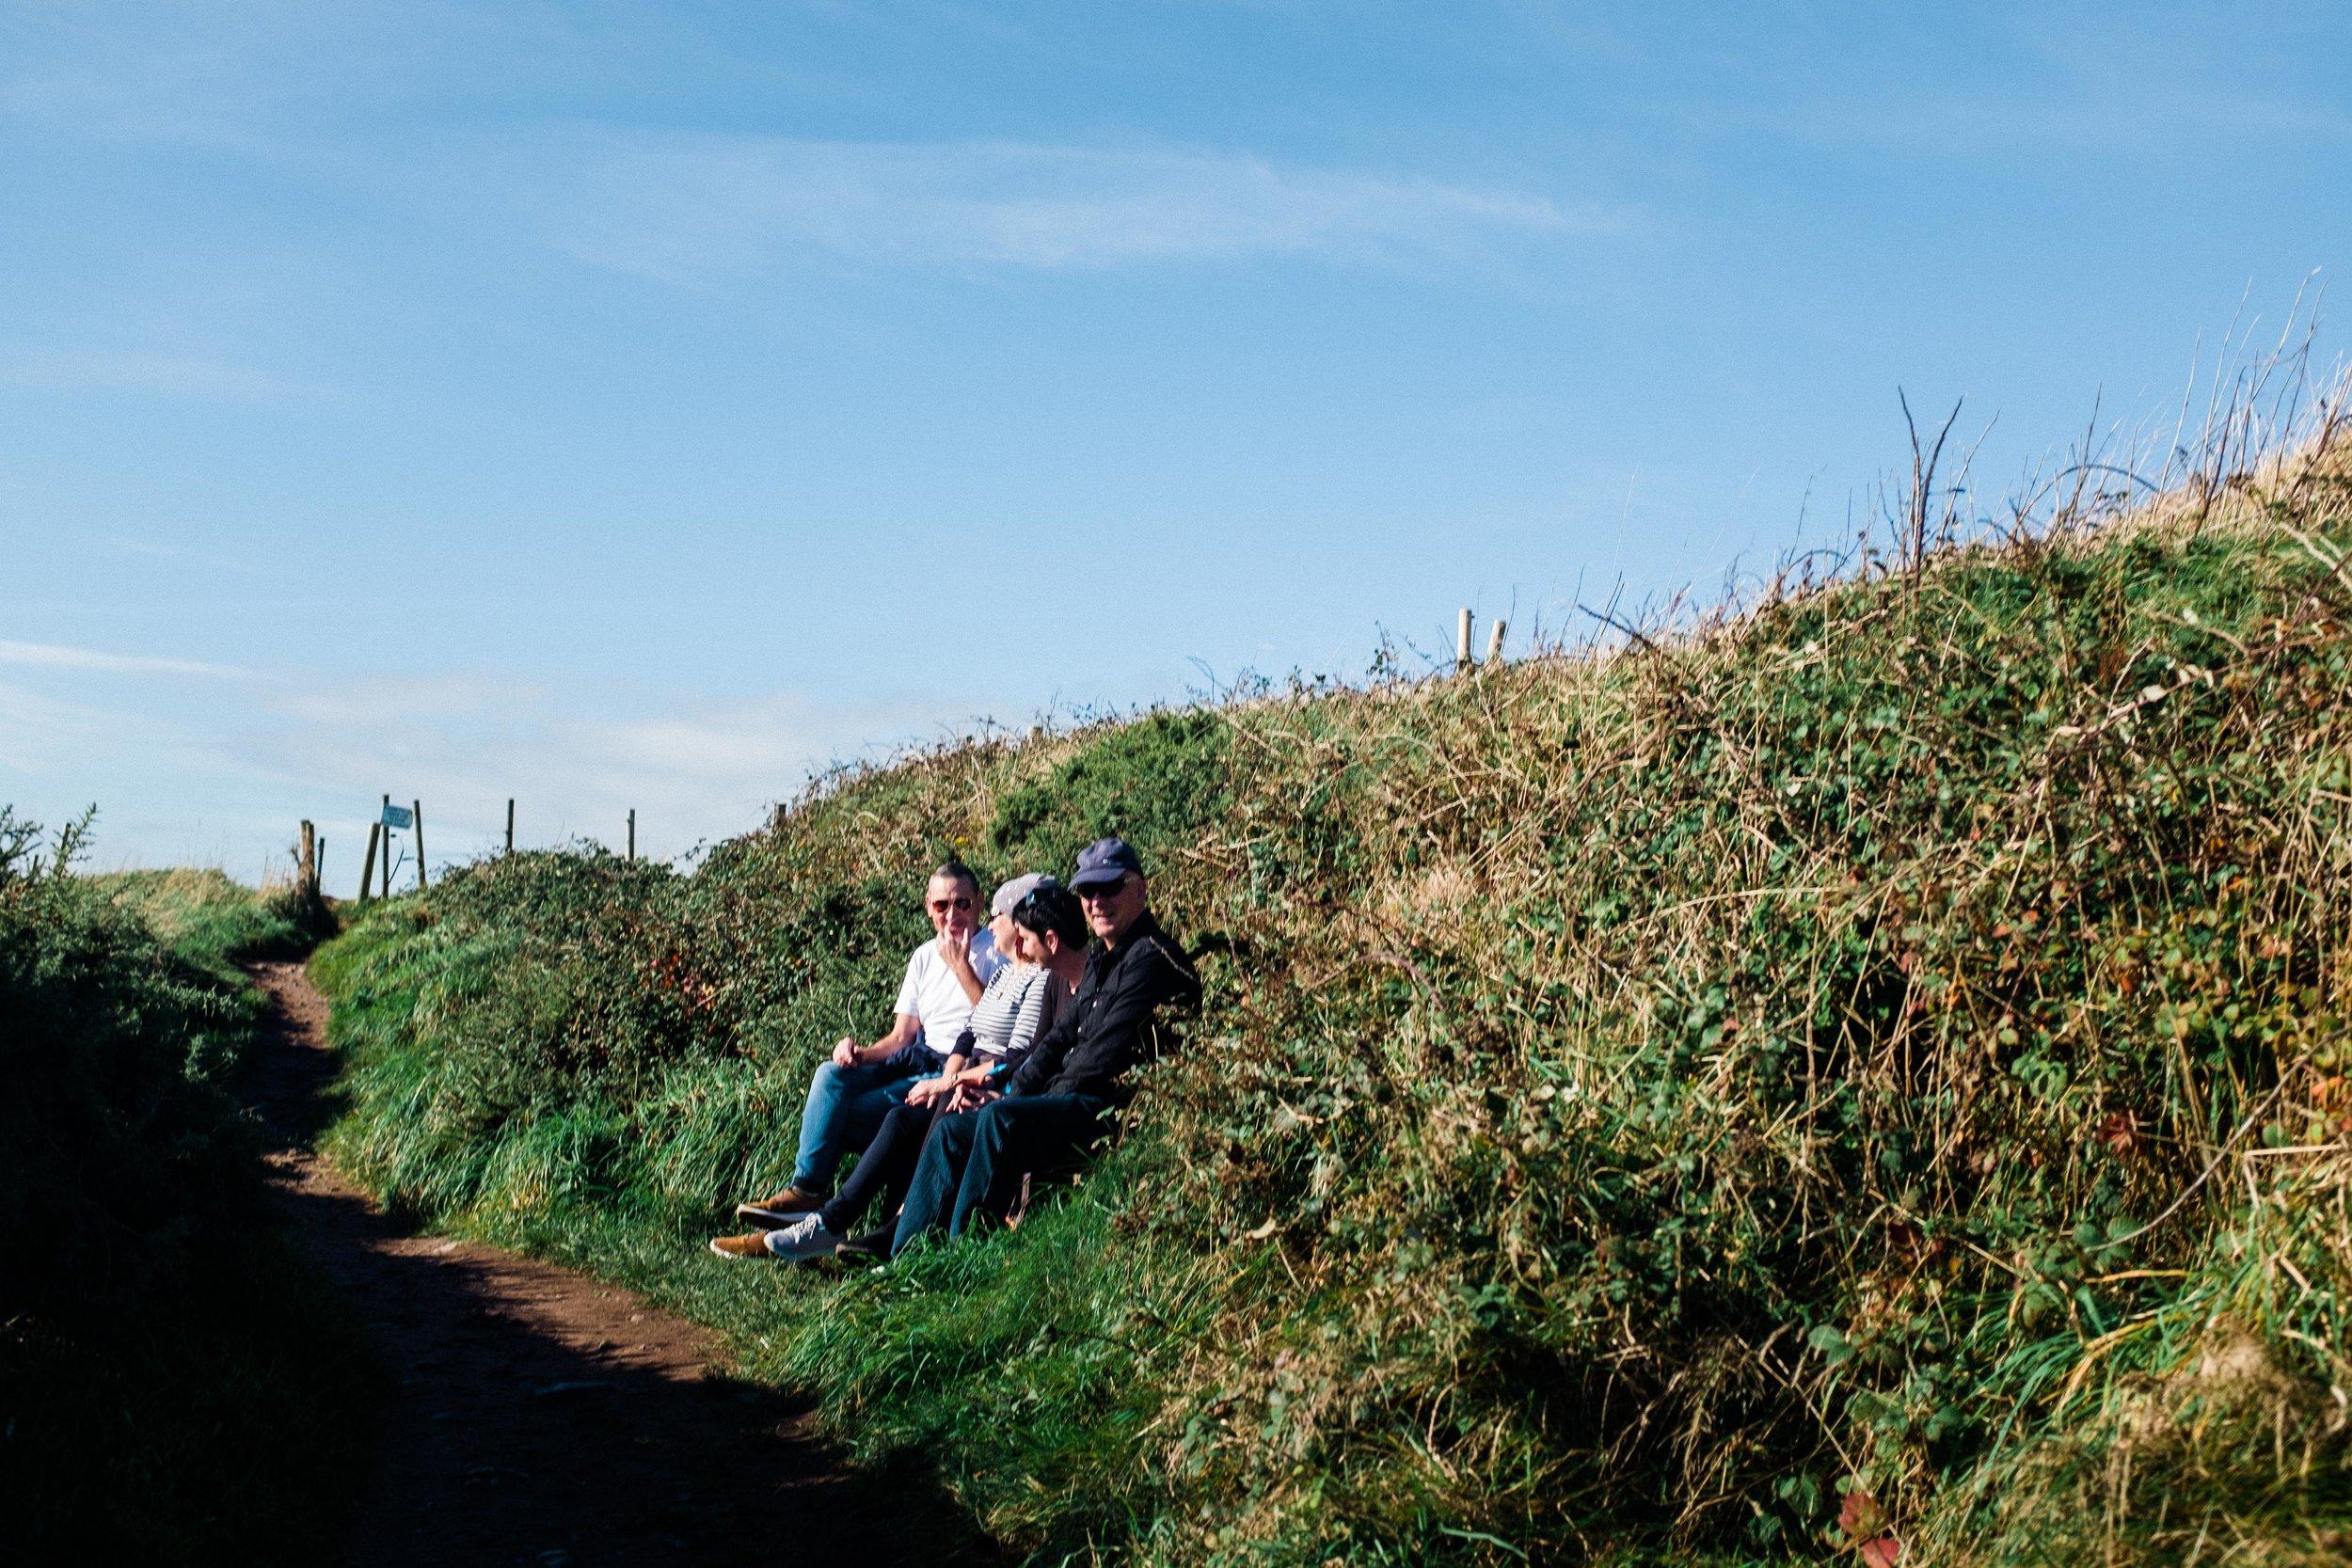 ballycotton-ireland-cliff-walk-5930.jpg